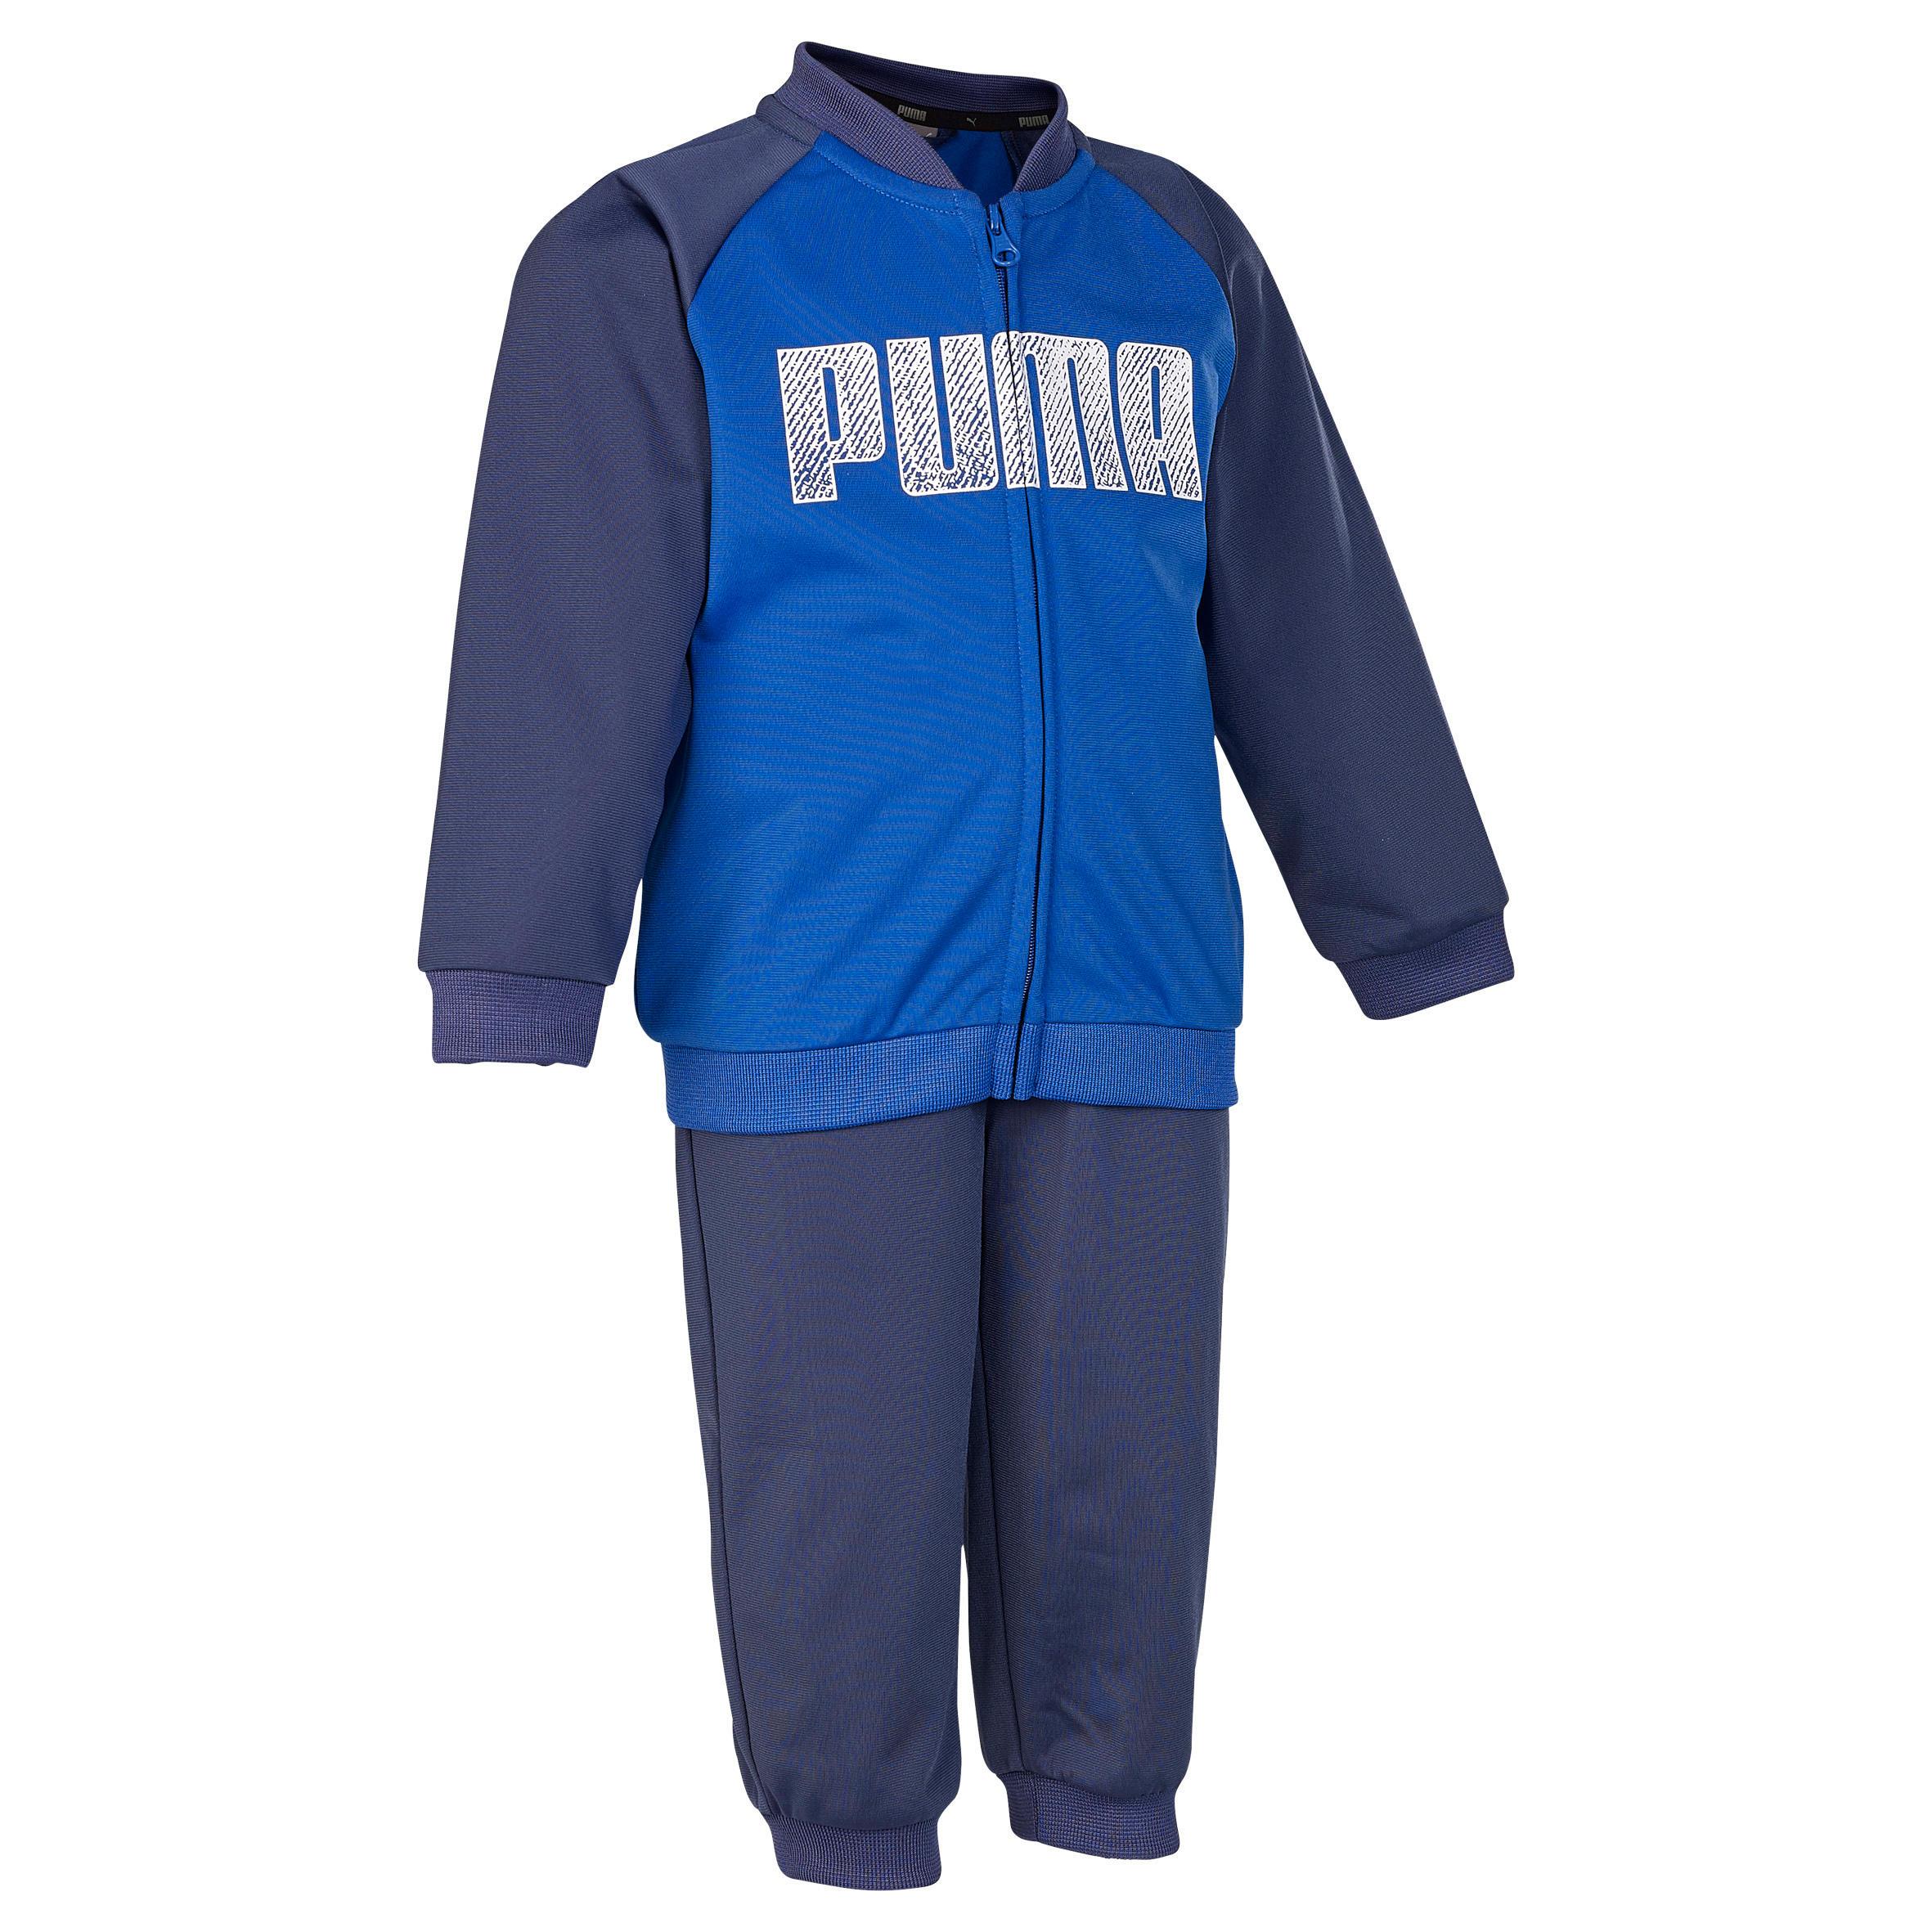 Puma Trainingspak voor kleutergym blauw